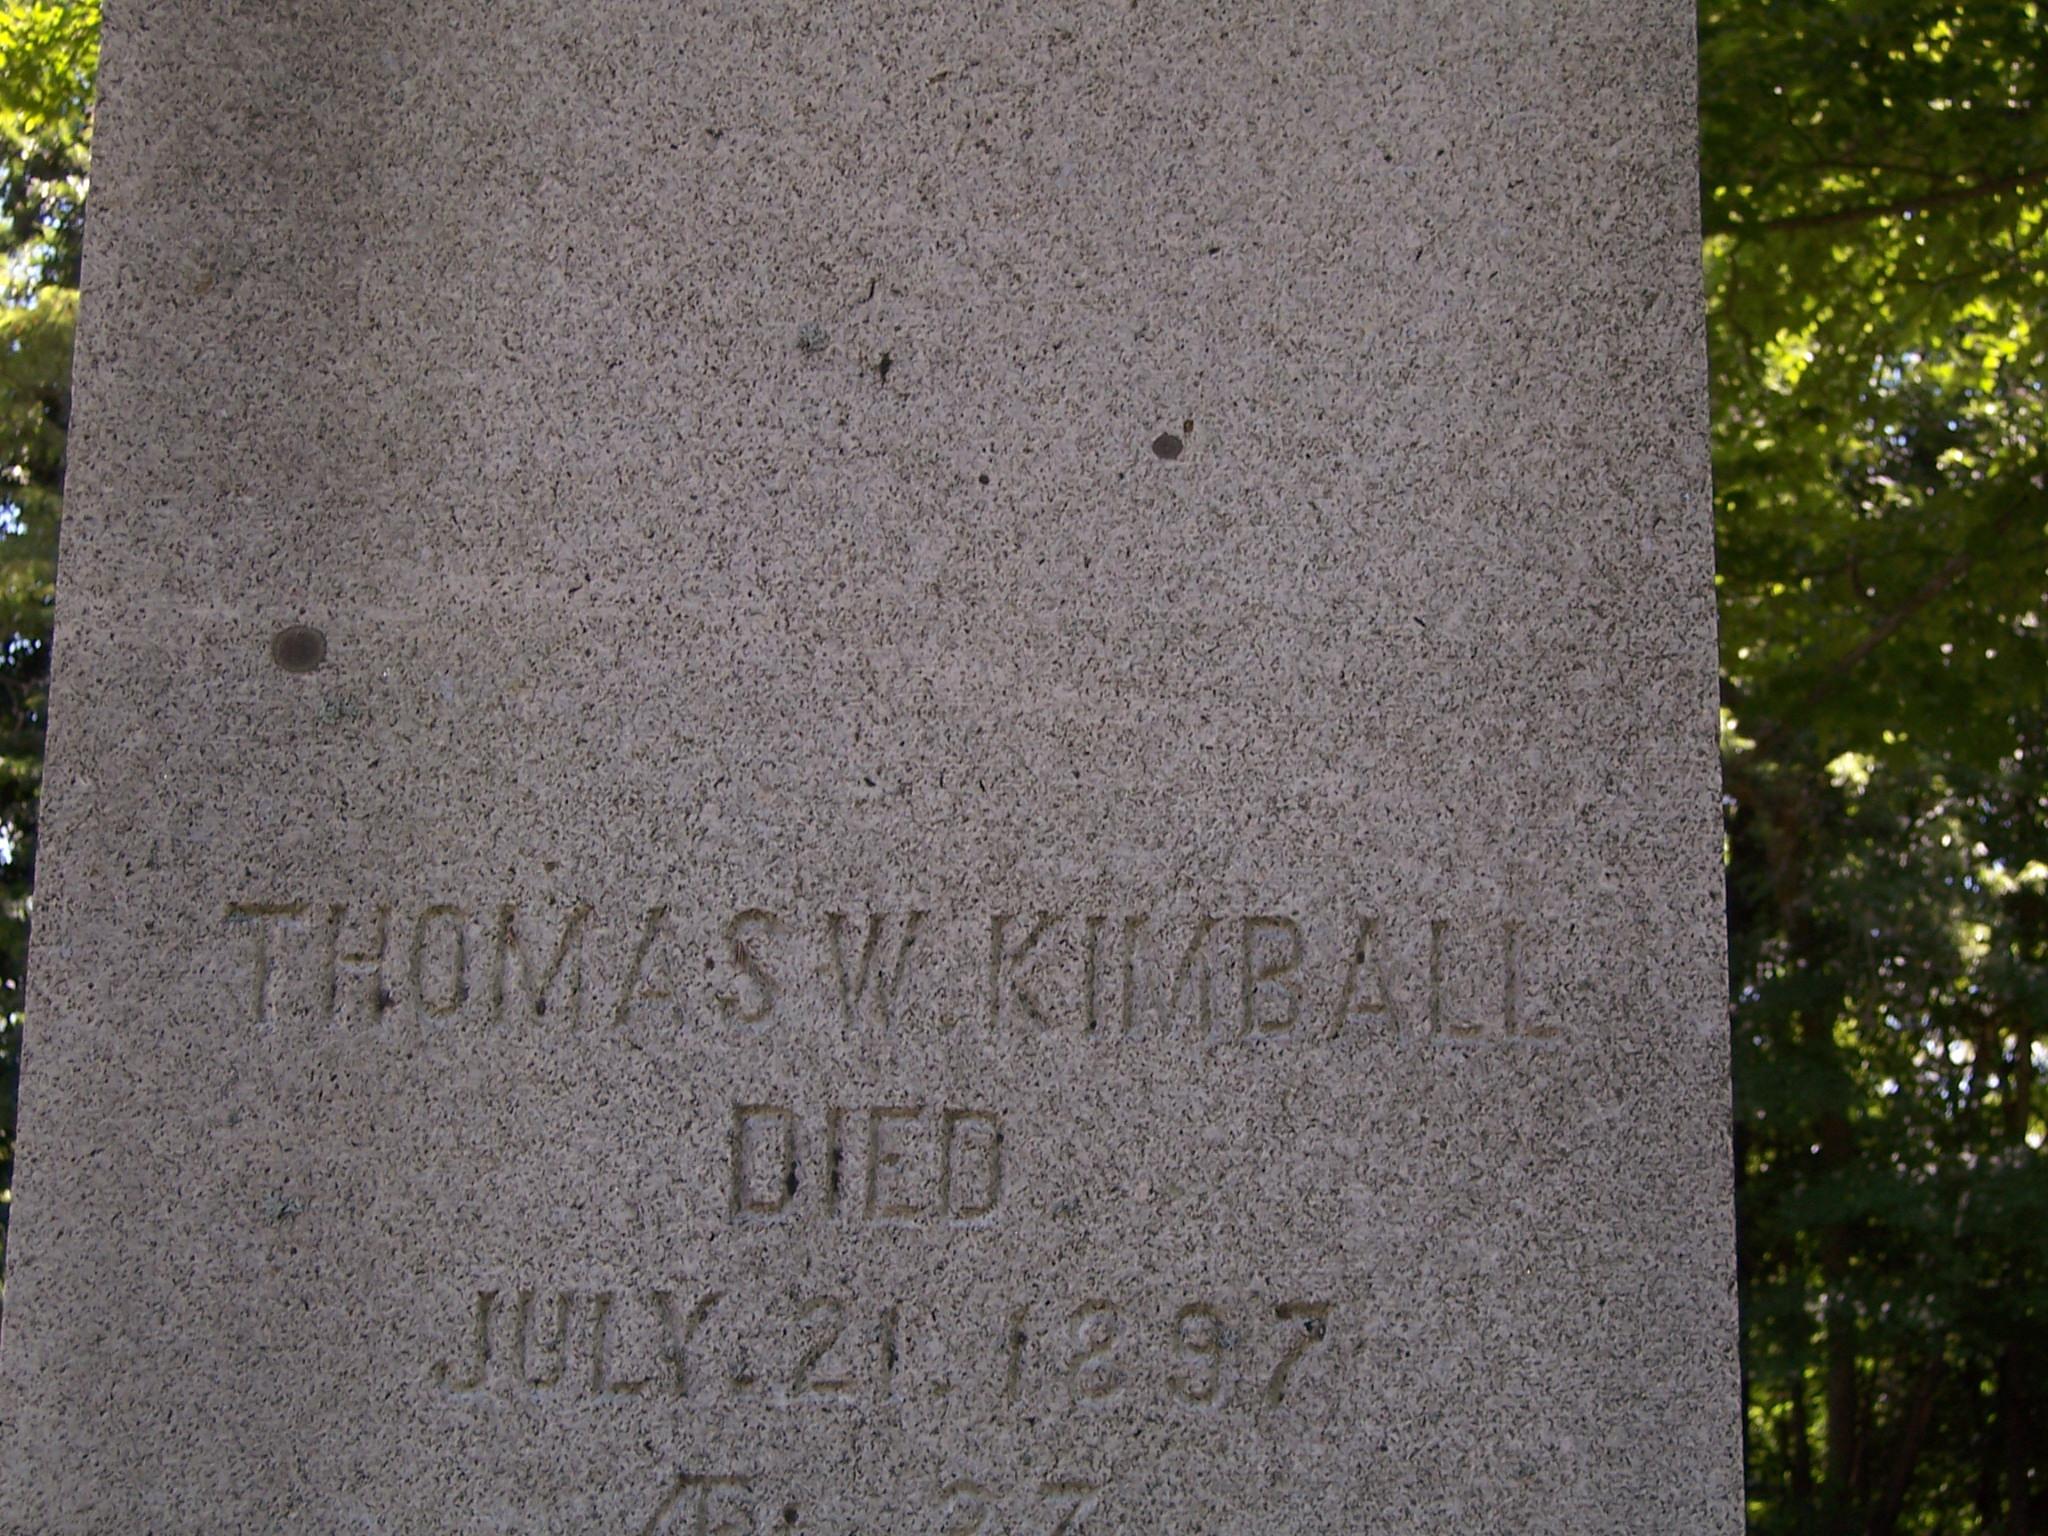 Winifred Kimball